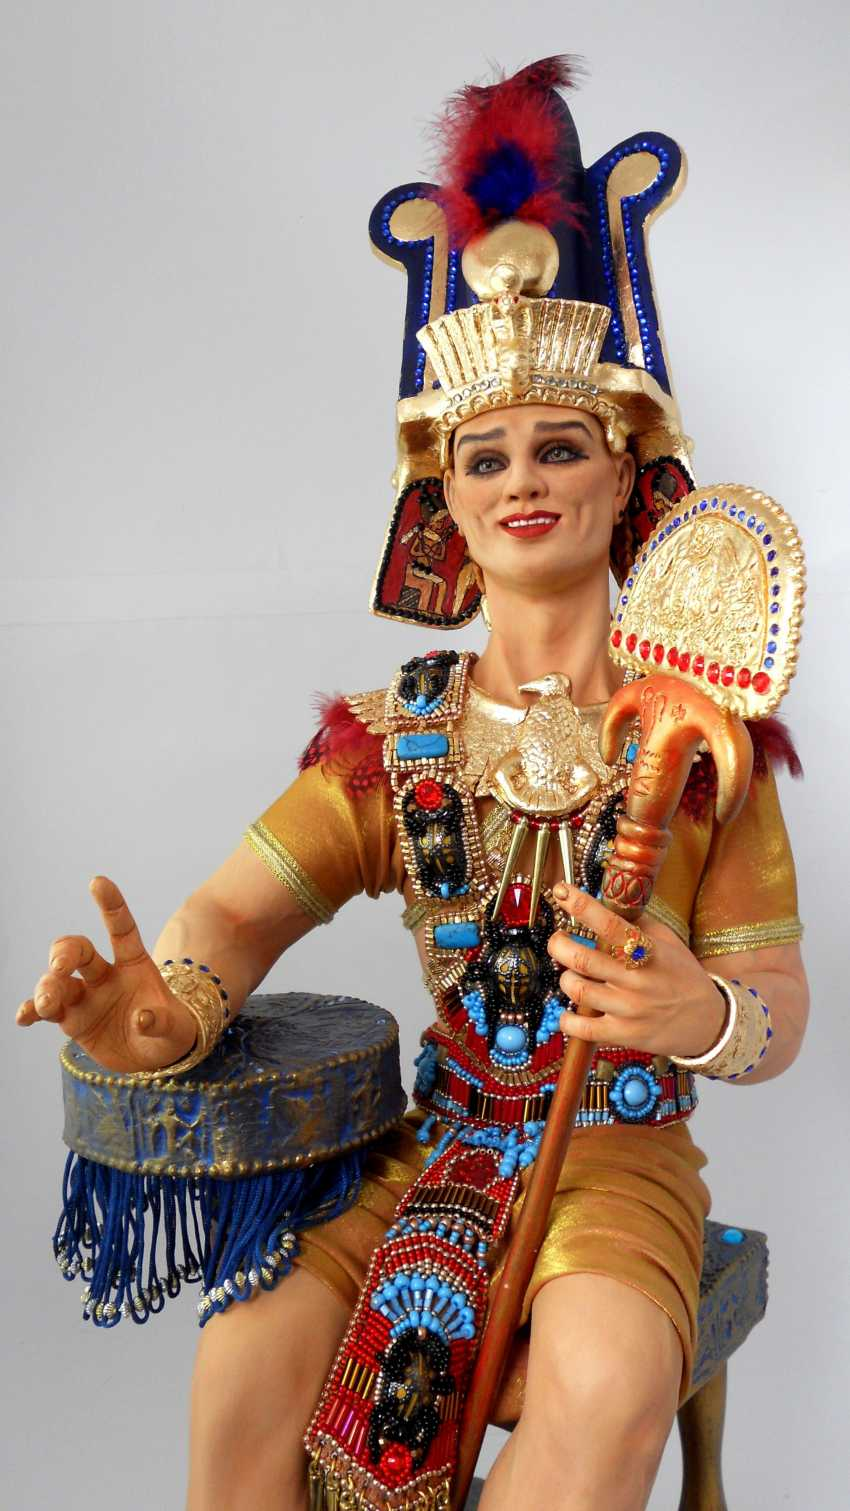 Margarita Kazantseva. Collectible doll the Pharaoh SETI - photo 1